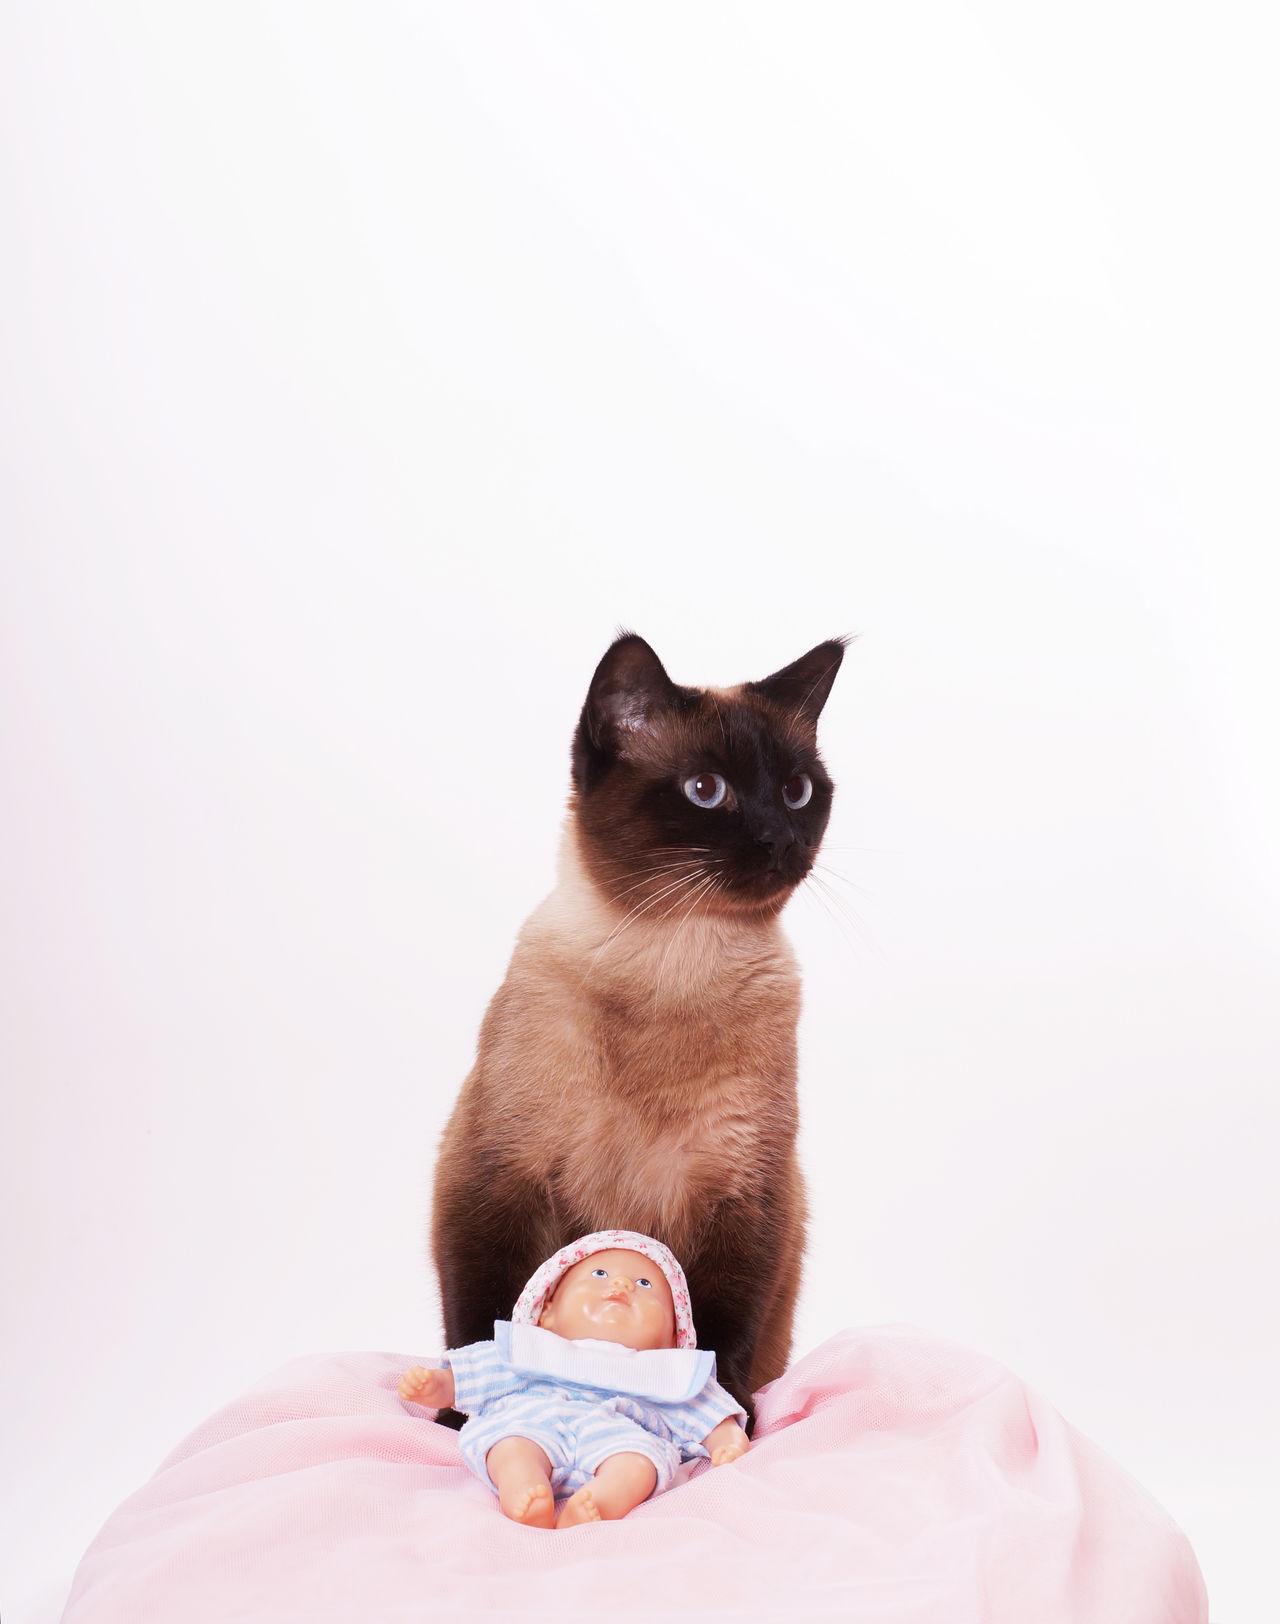 Beautiful stock photos of lustige tiere, pets, domestic animals, one animal, mammal